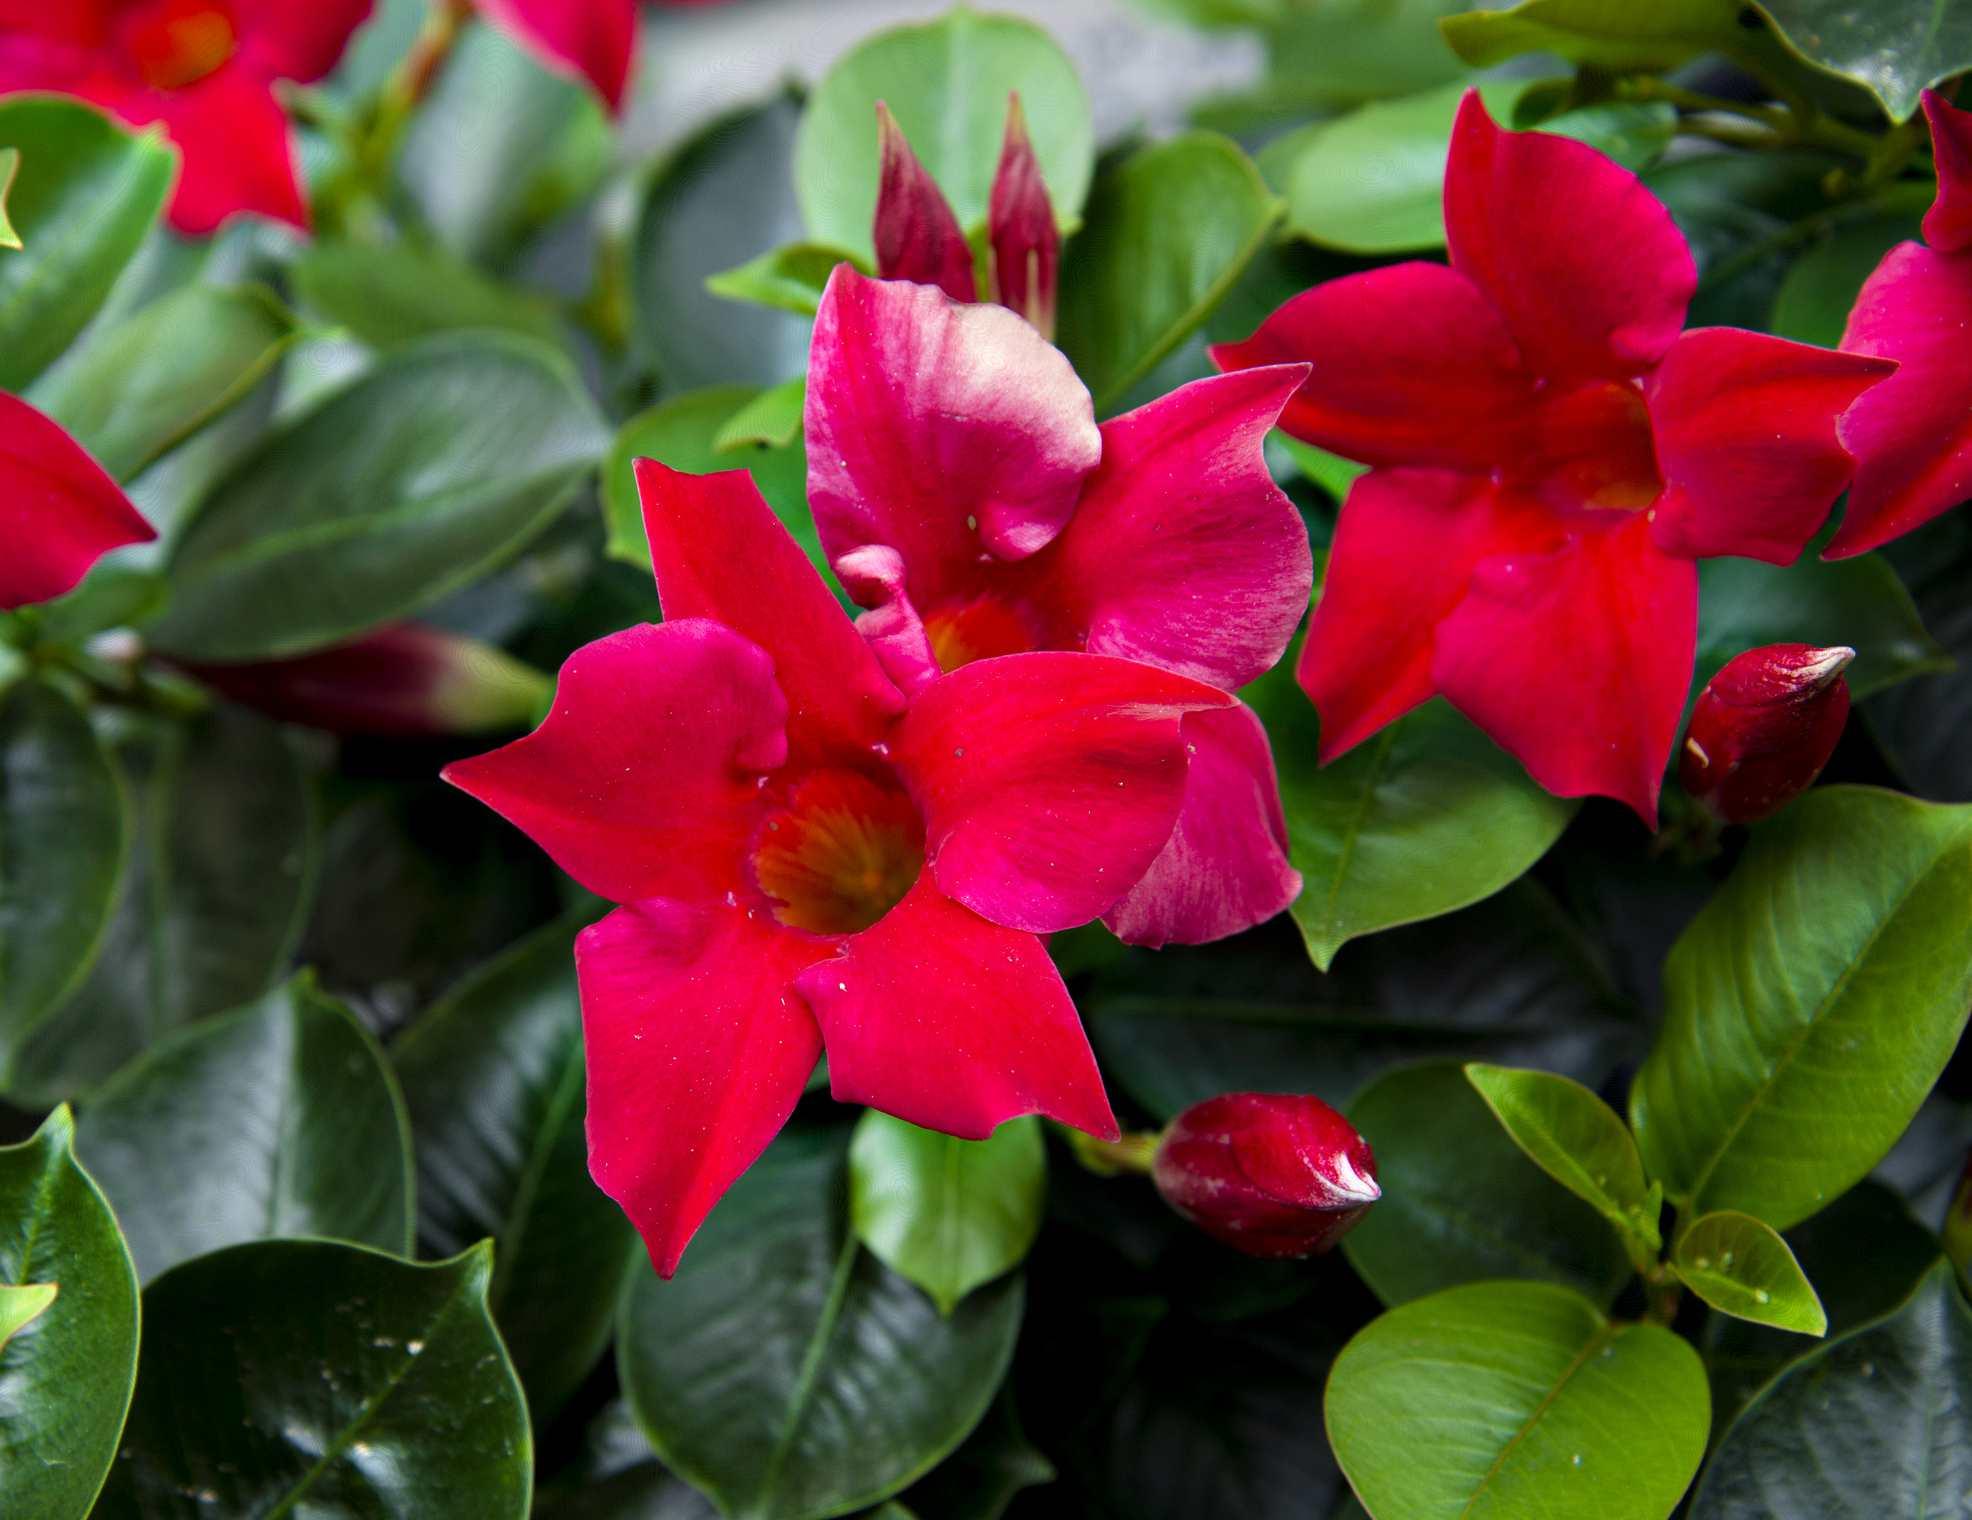 Red Mandevilla flowers in bloom.